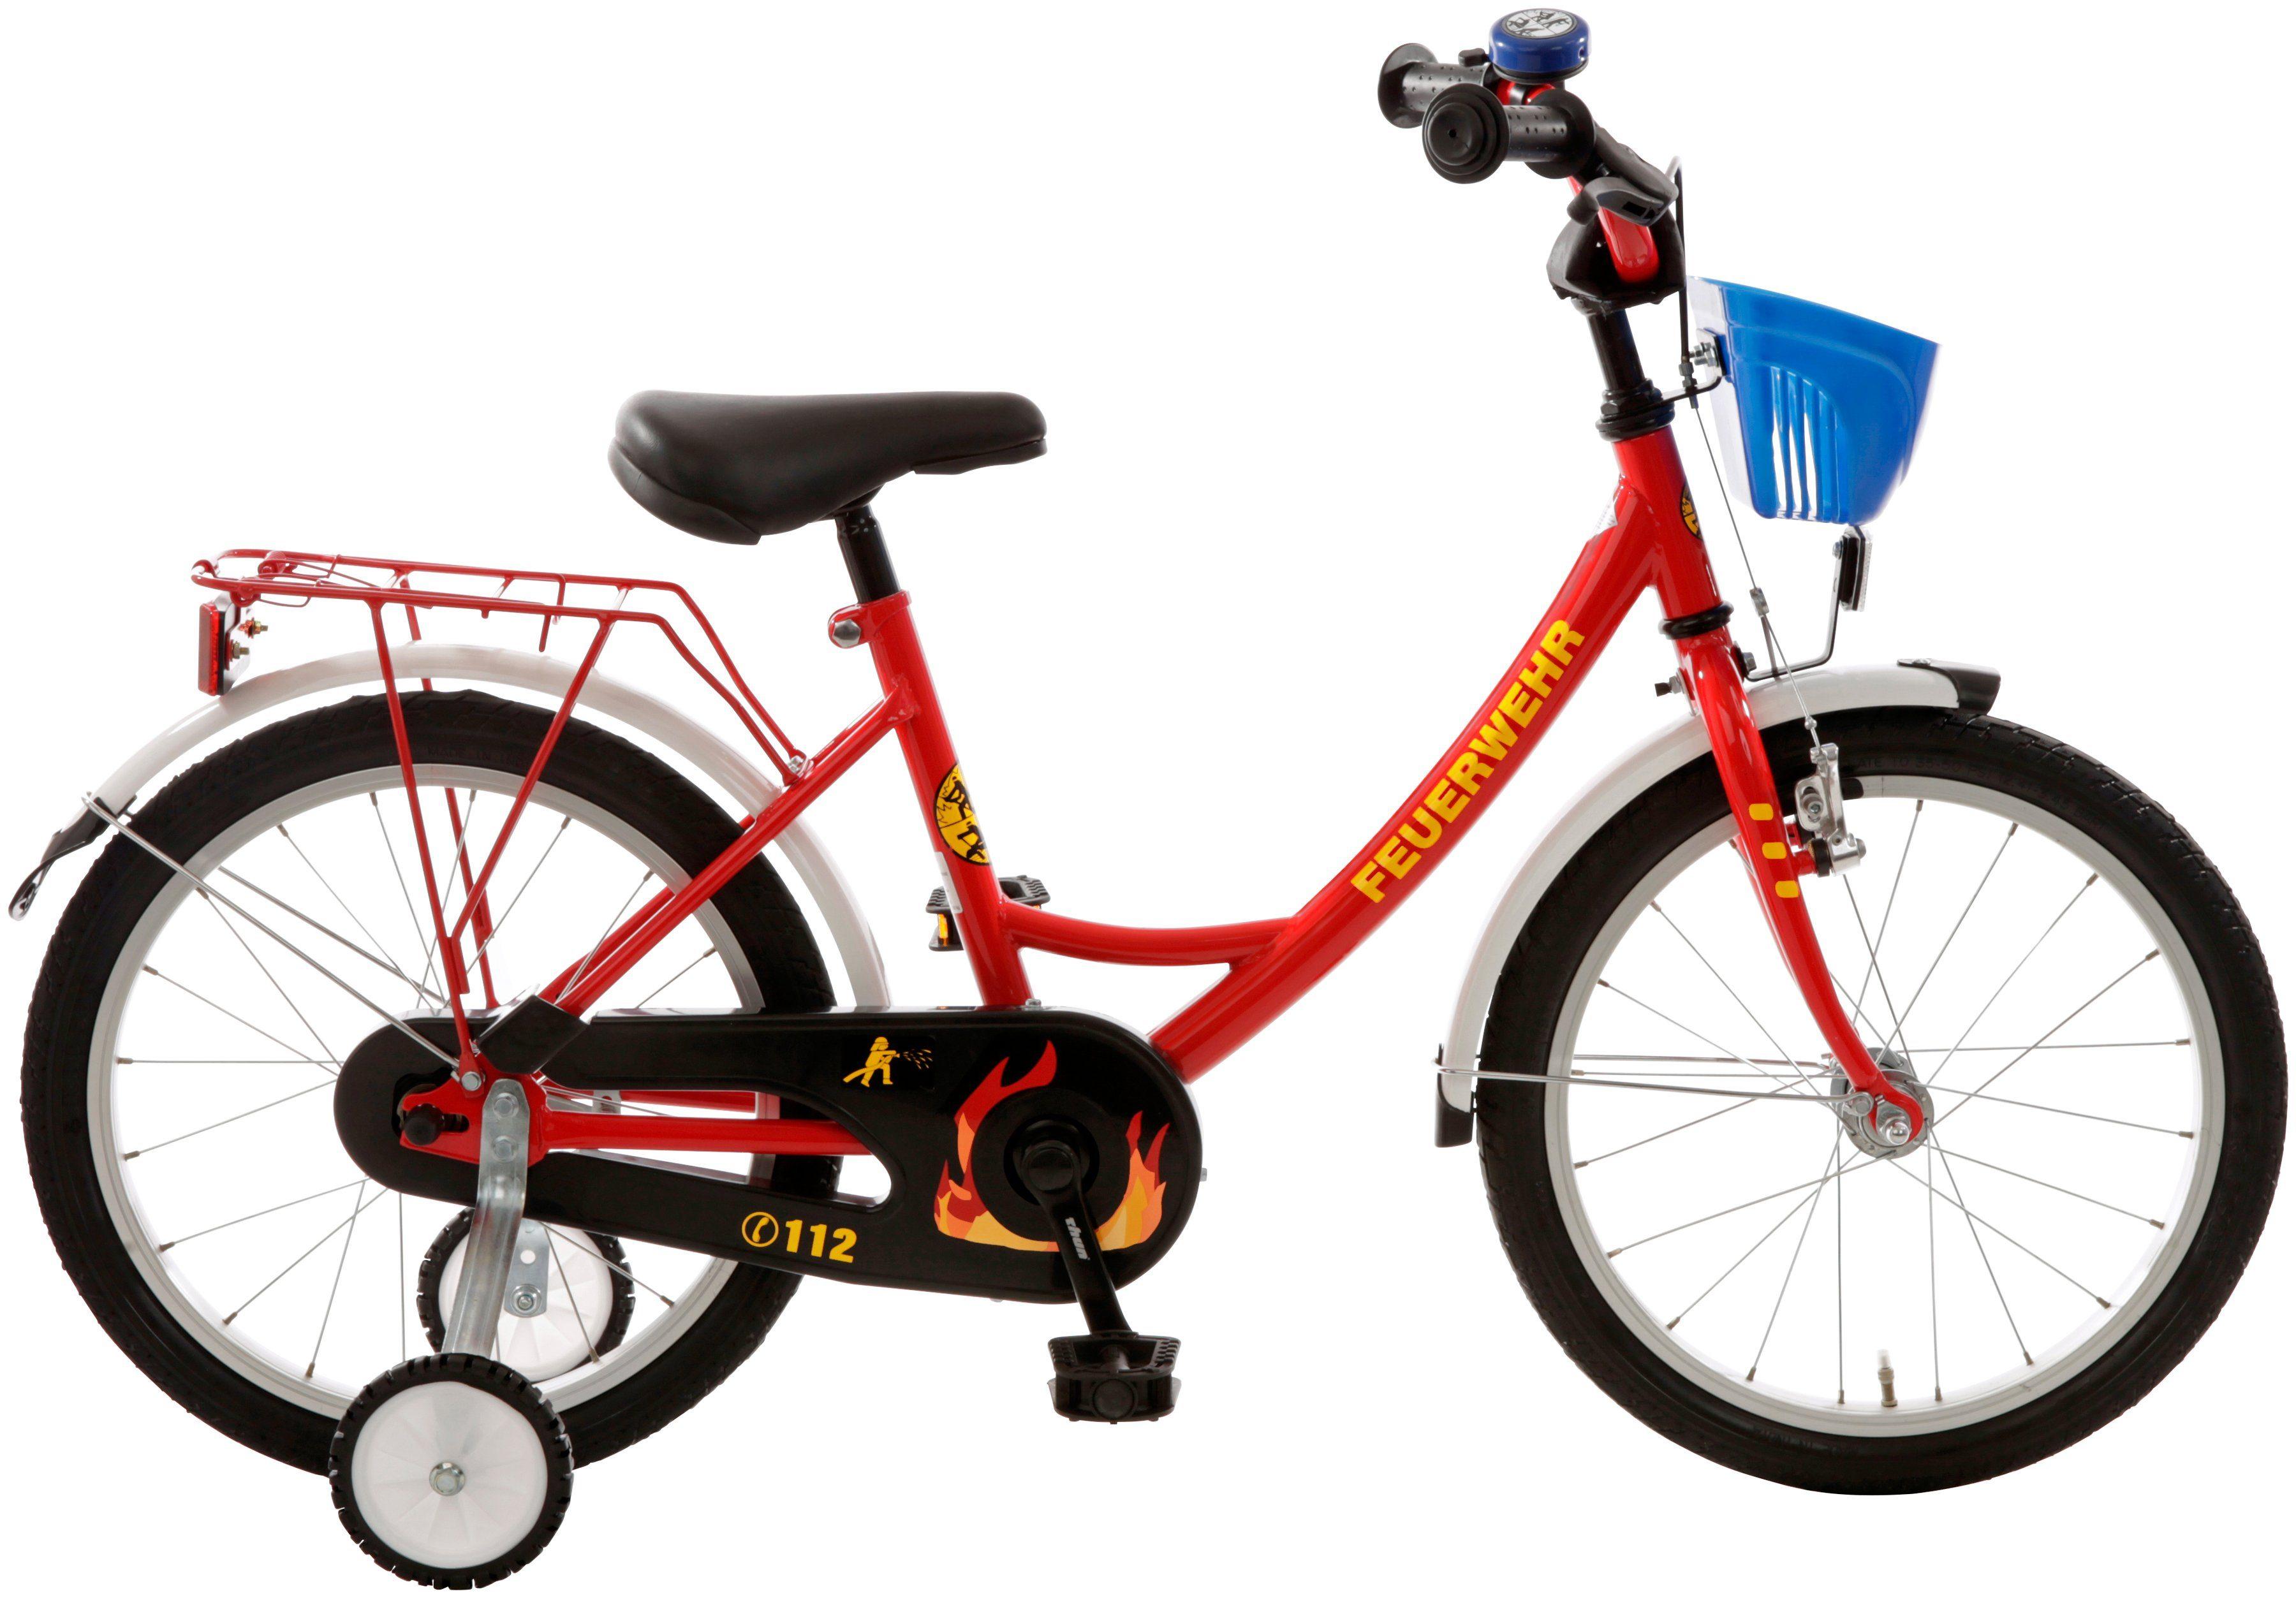 CYCLES4KIDS Kinderfahrrad »Feuerwehr «, 18 Zoll, 1 Gang, Rücktrittbremse